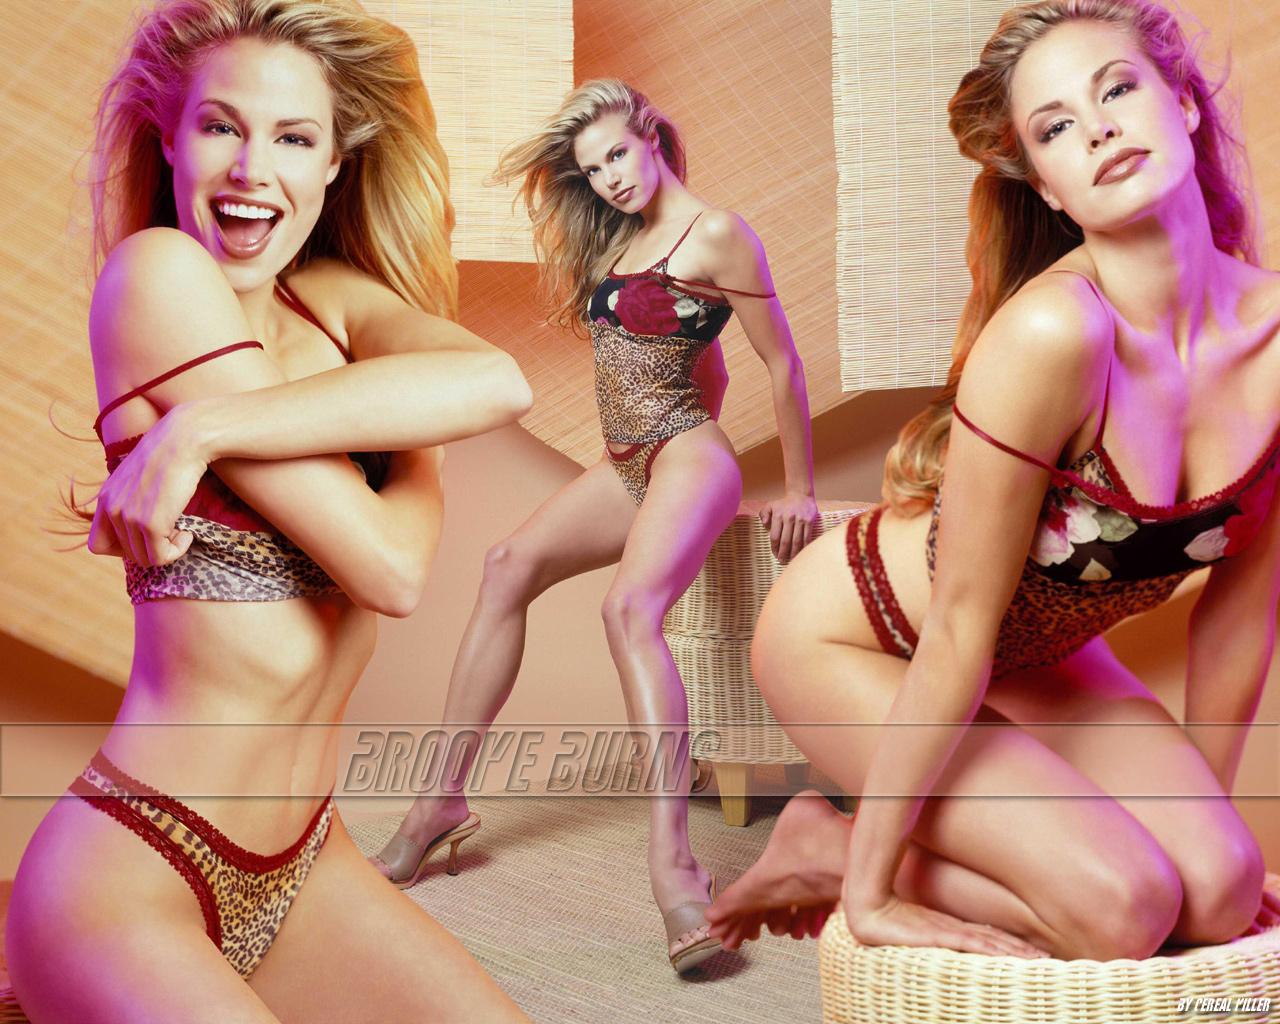 Brooke Burns Topless wonders of the world: february 2011